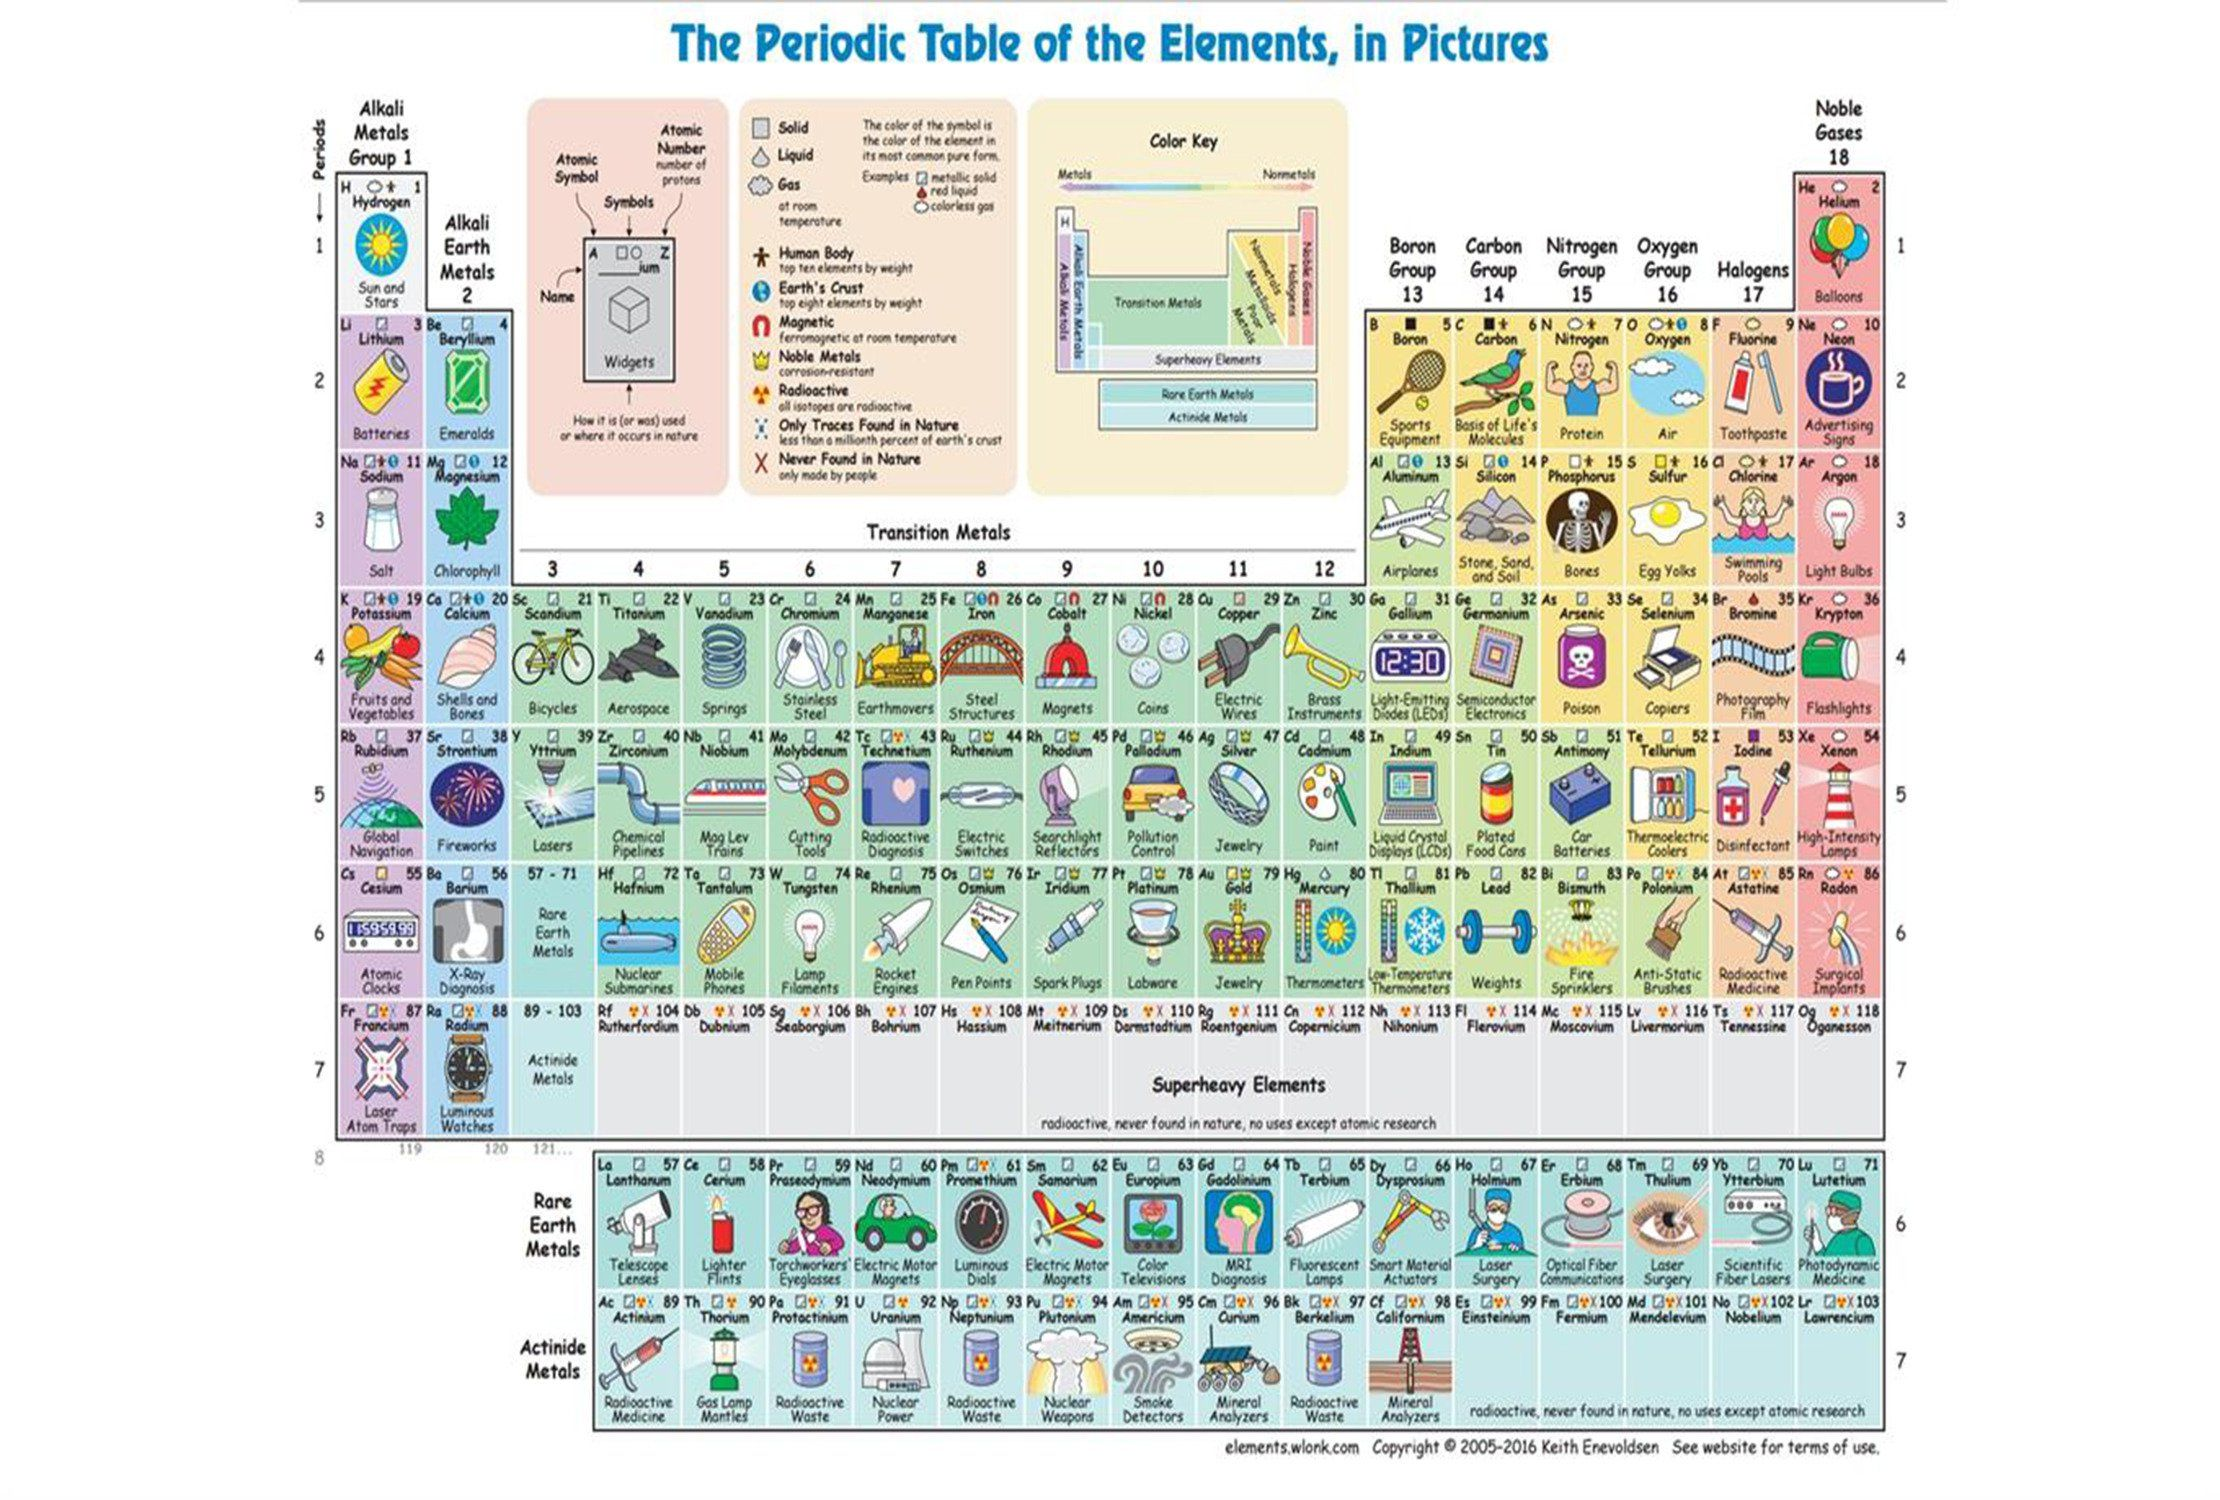 tabla periodica interactiva - Tabla Periodica Interactiva Descargar Gratis Espanol